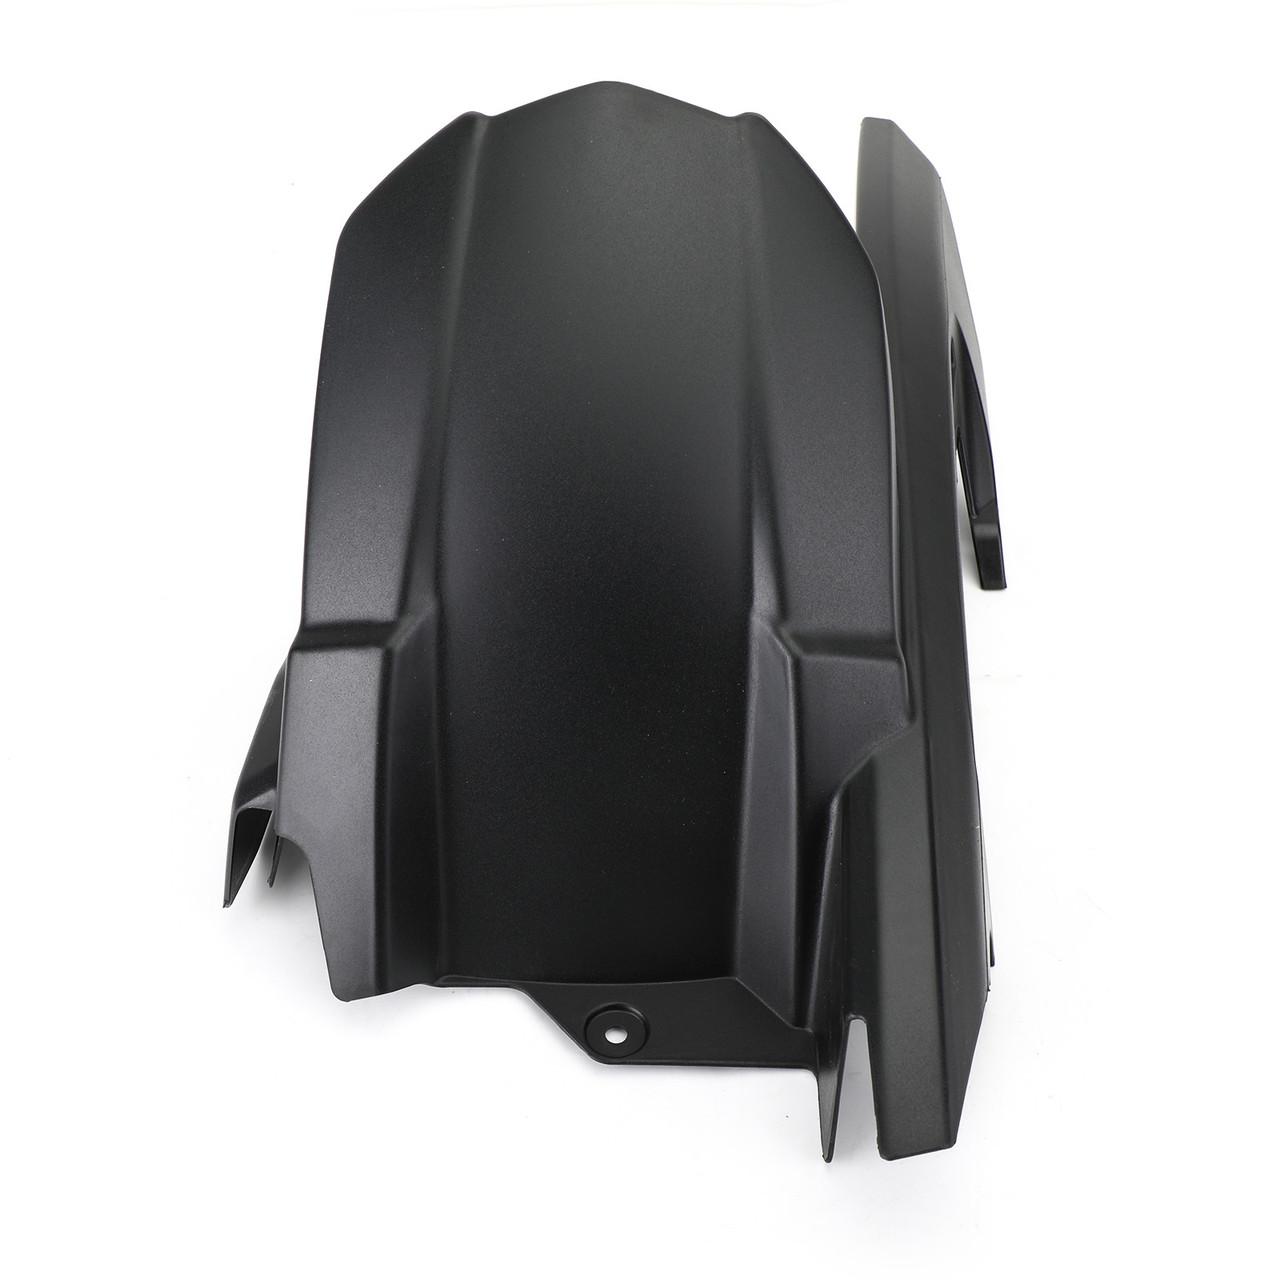 Rear Fender Mudguard Fits For KAWASAKI Z900 Z900RS 17+ Black